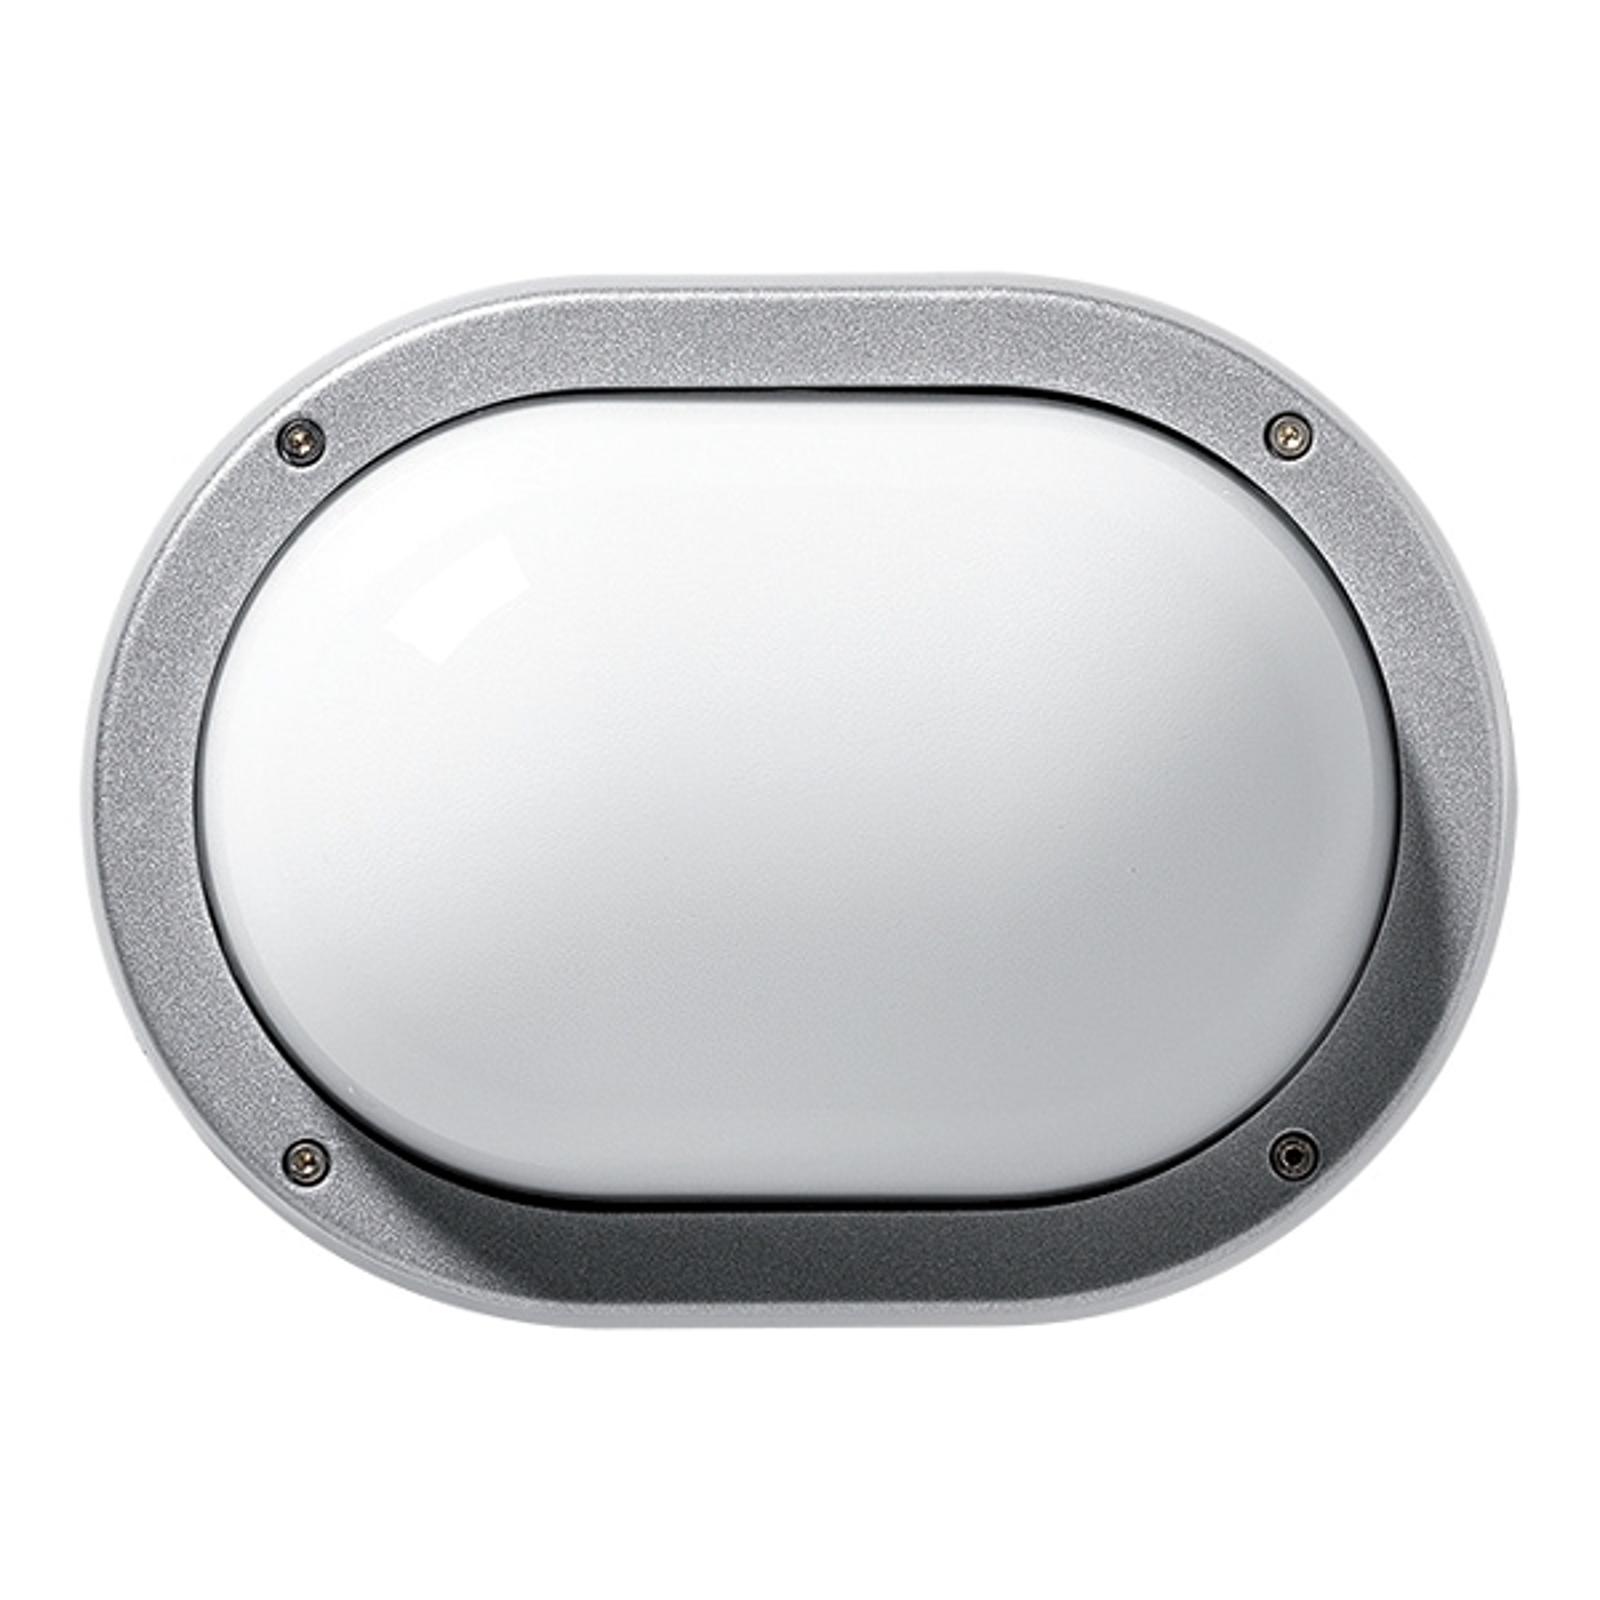 Praktische buitenwandlamp EKO, grijs